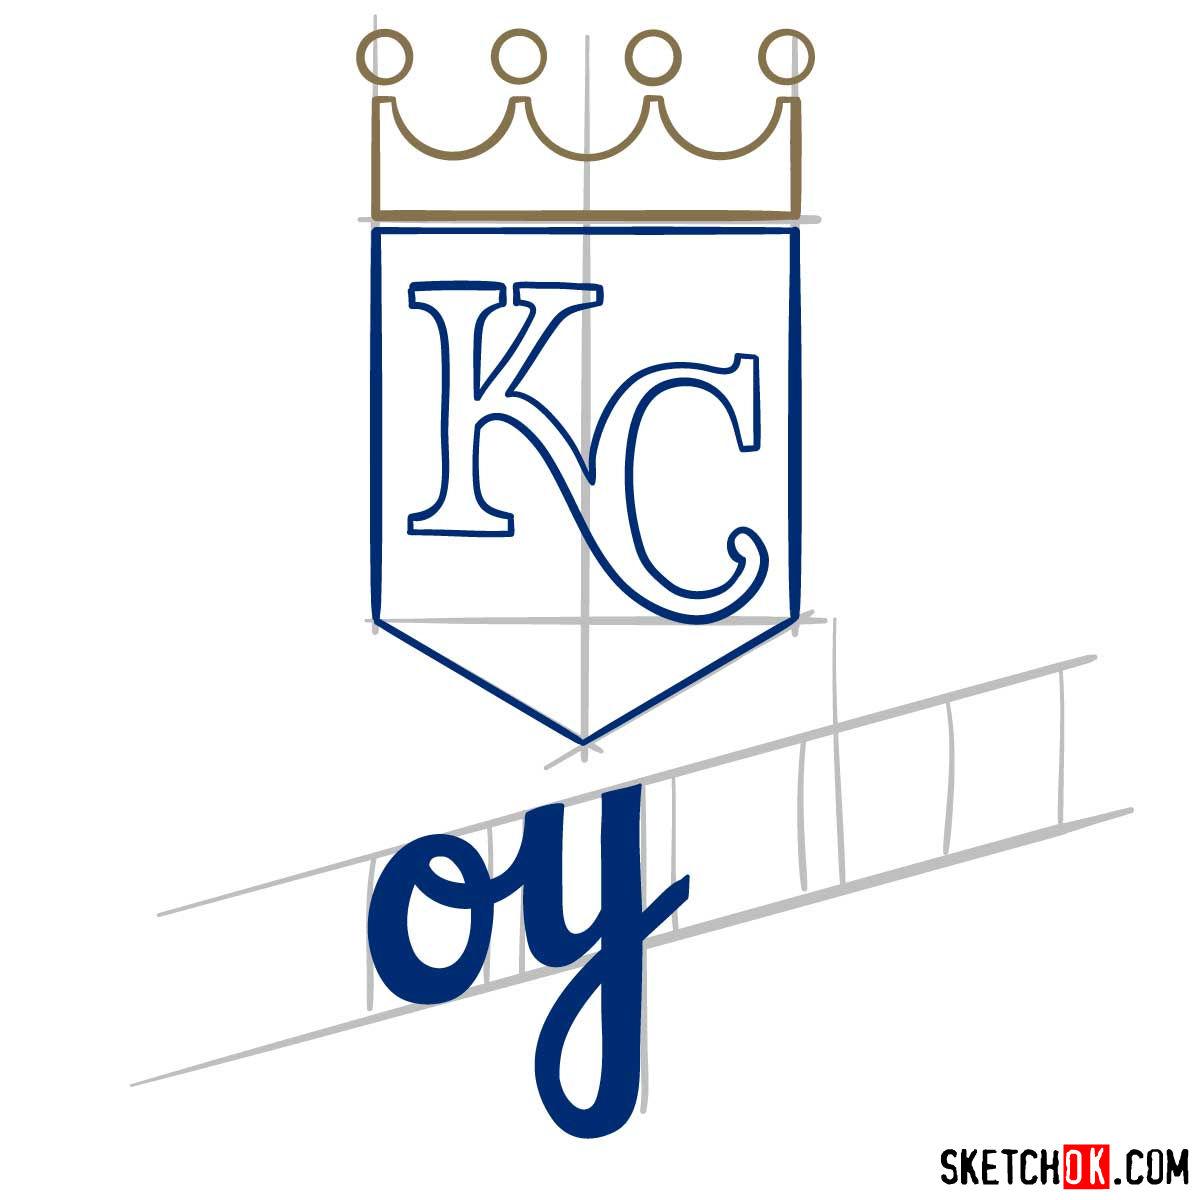 How to draw Kansas City Royals logo | MLB logos - step 06